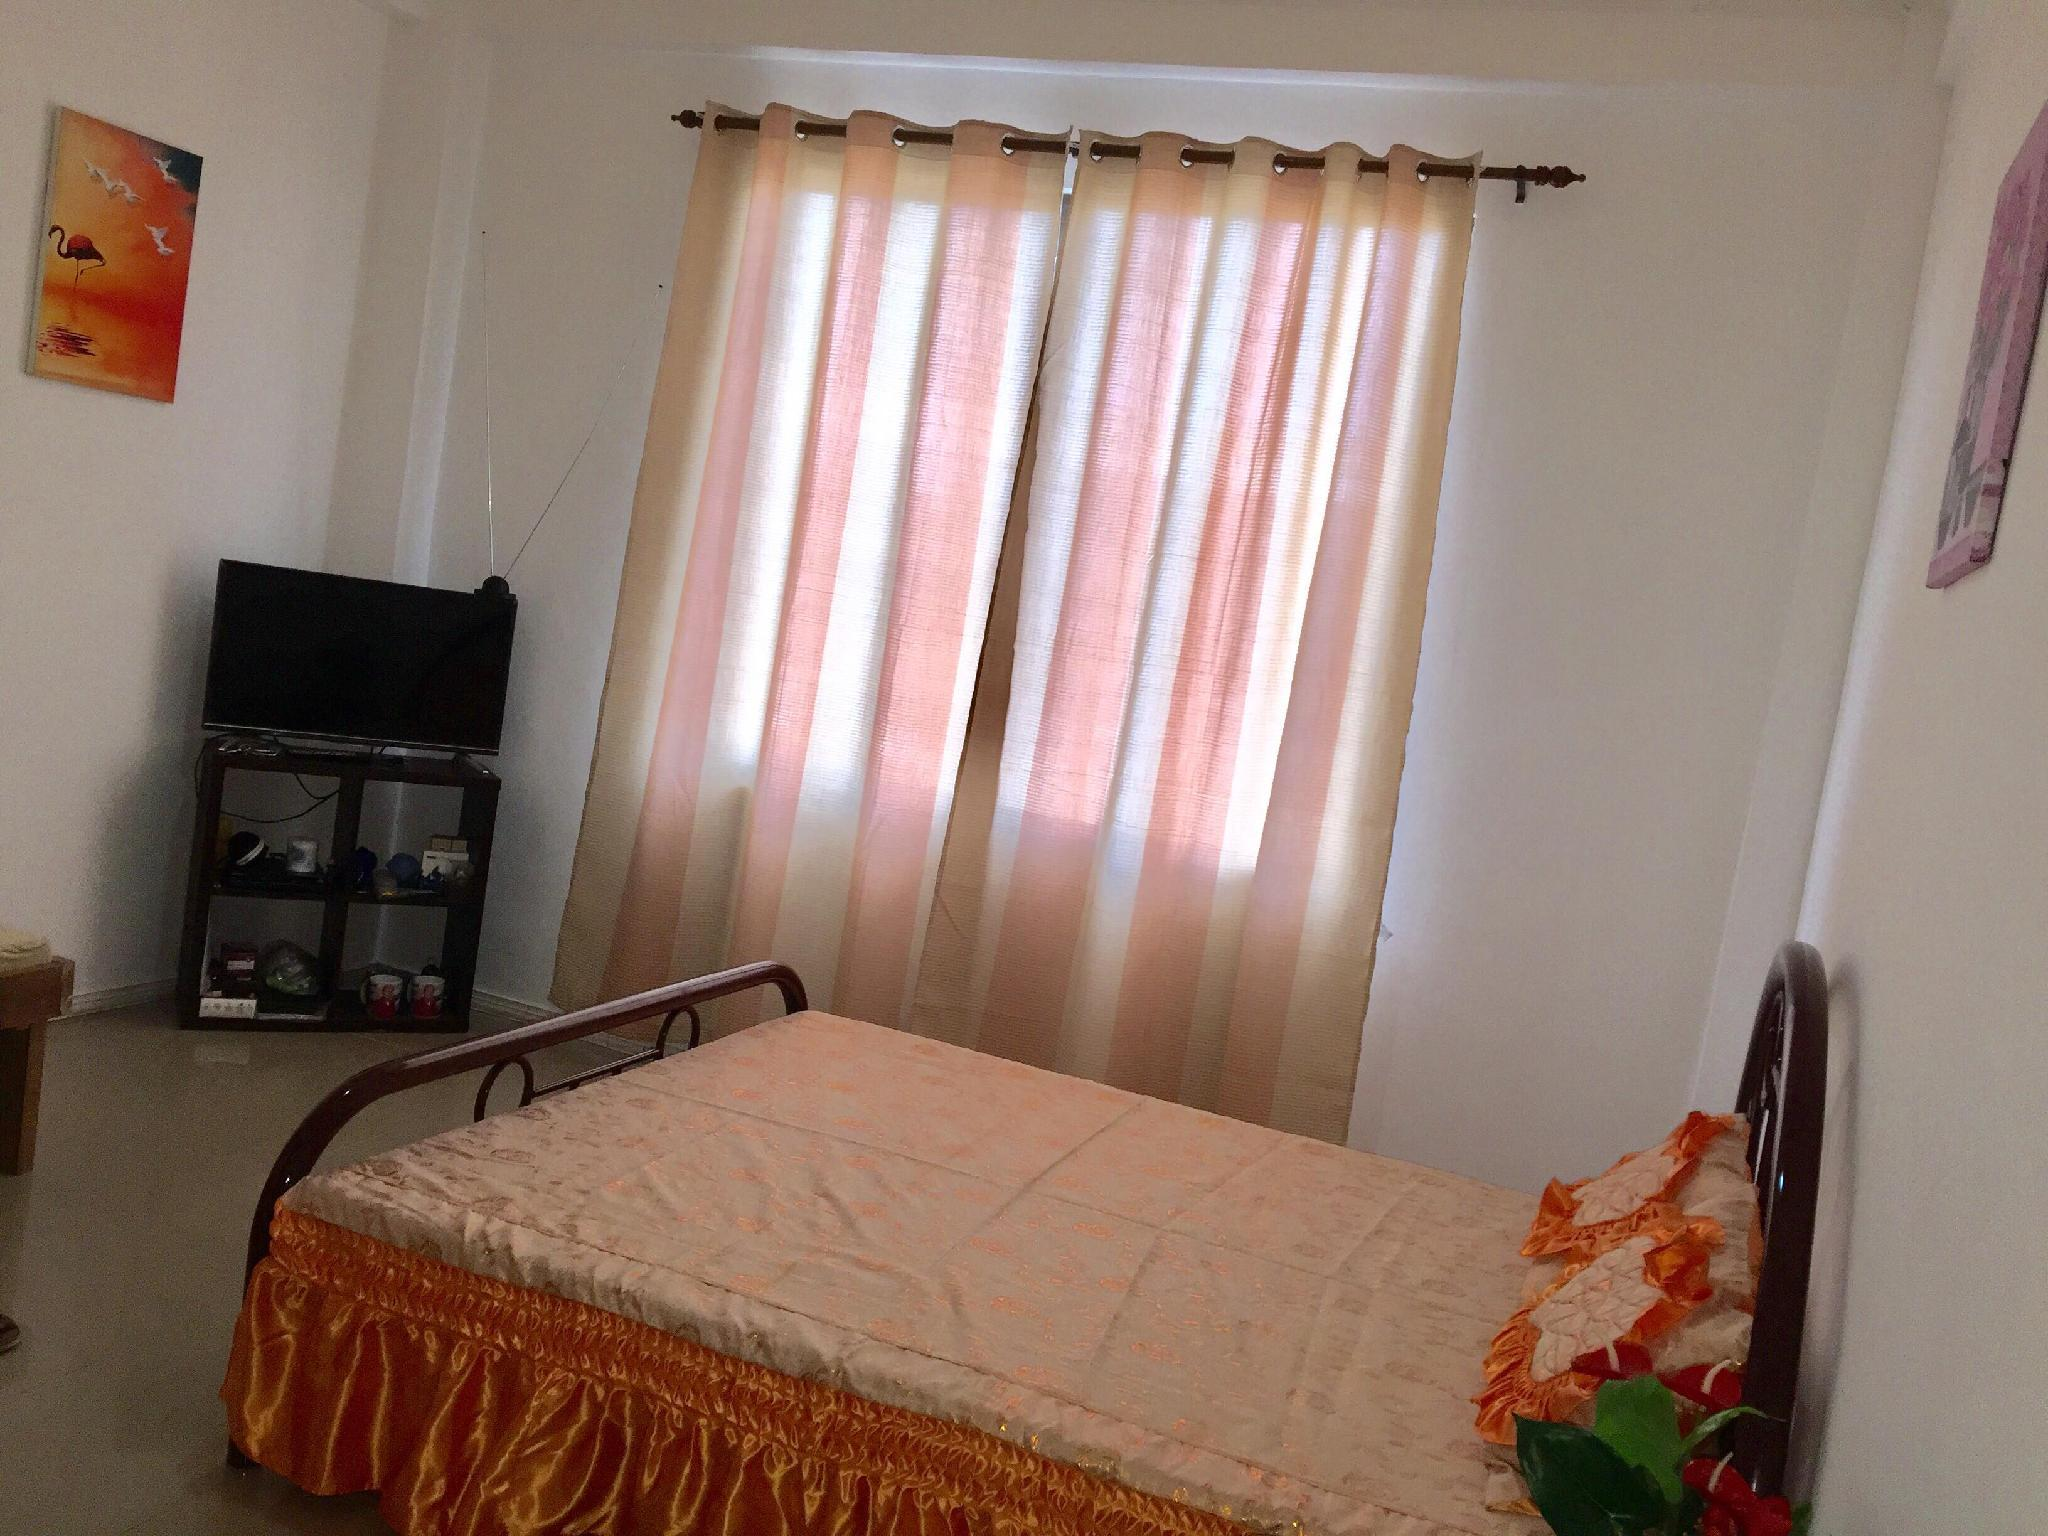 Jam's Private Room Rental + Cheap + Wifi